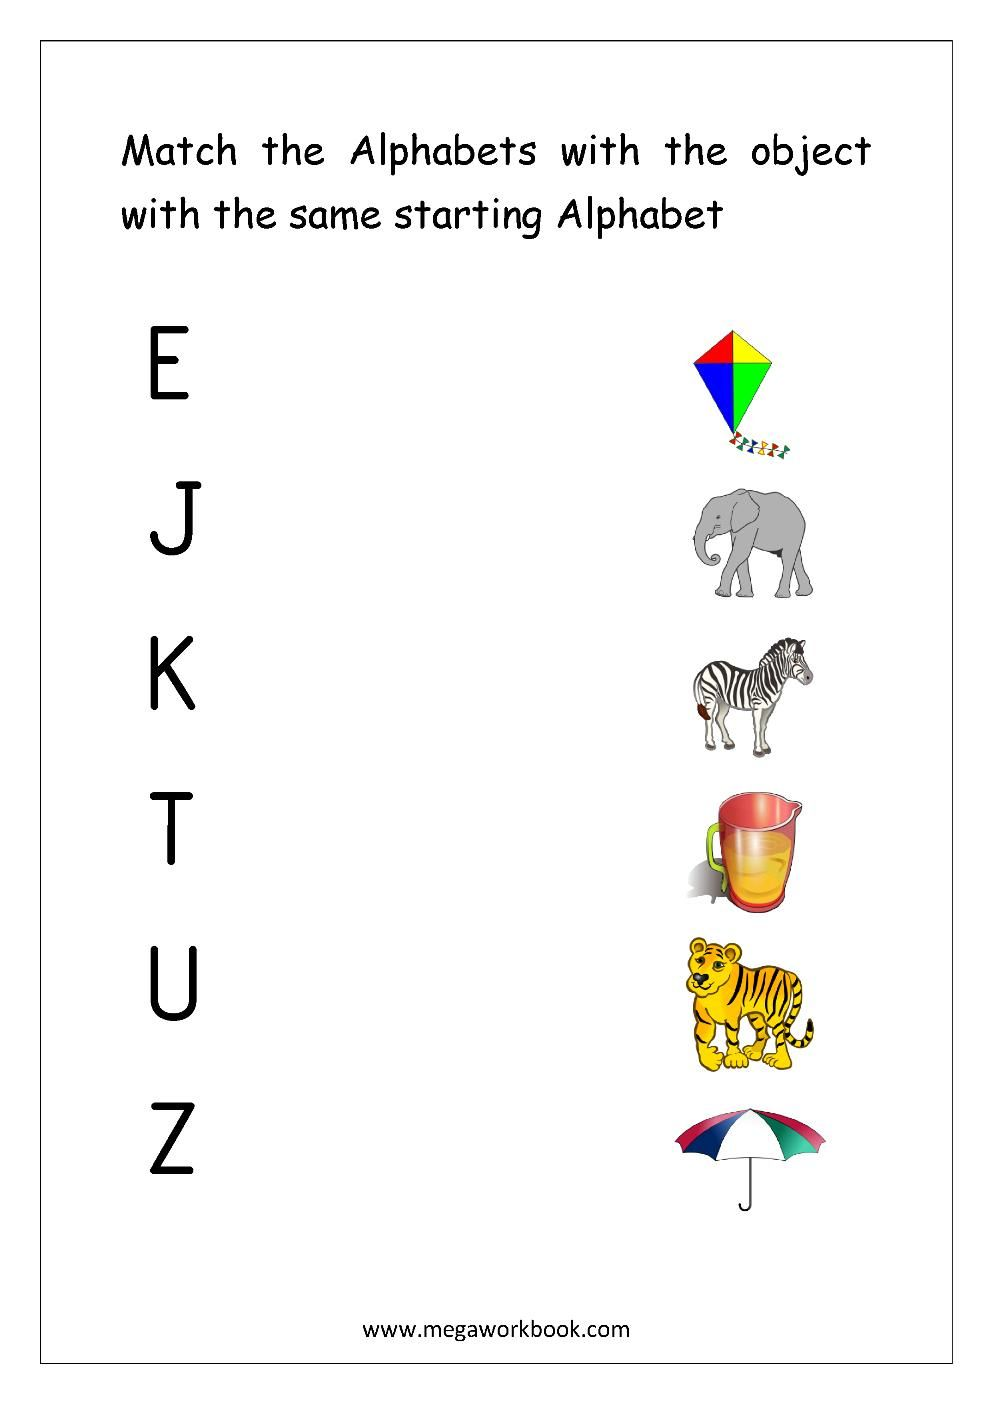 8 Alphabet Matching Worksheets In 2020 Alphabet Matching Alphabet Worksheets Free Matching Worksheets